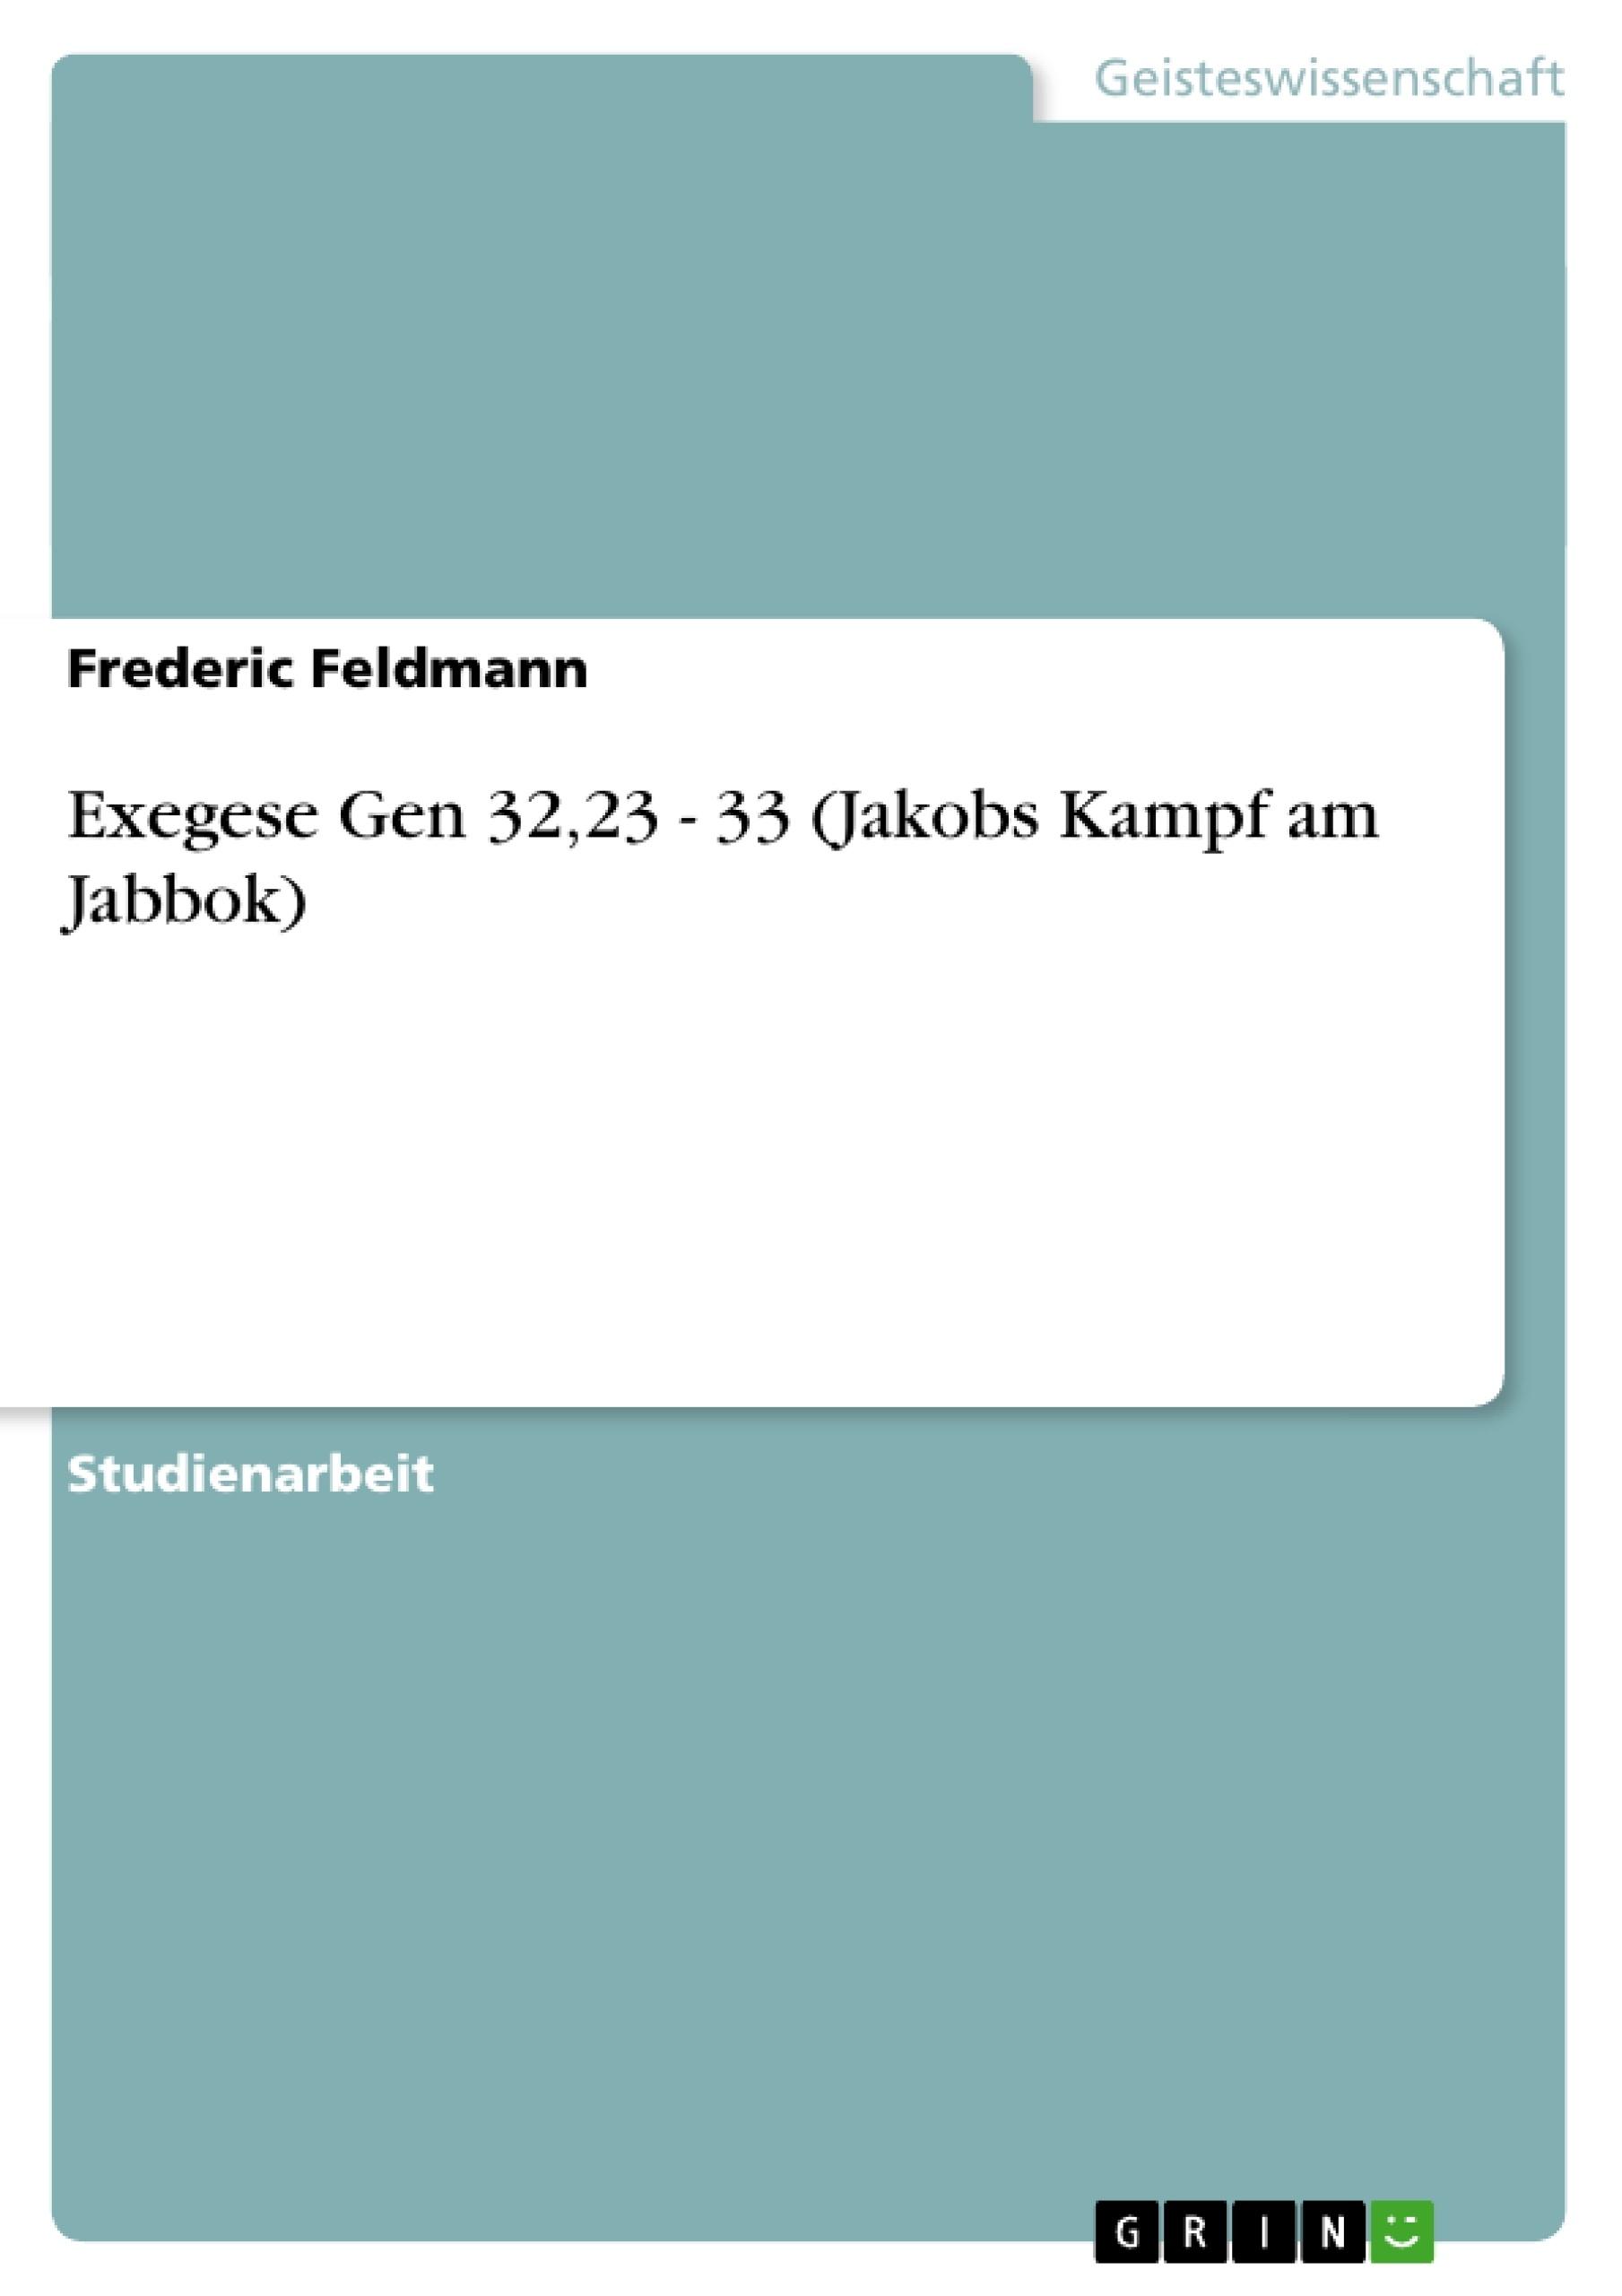 Titel: Exegese Gen 32,23 - 33 (Jakobs Kampf am Jabbok)